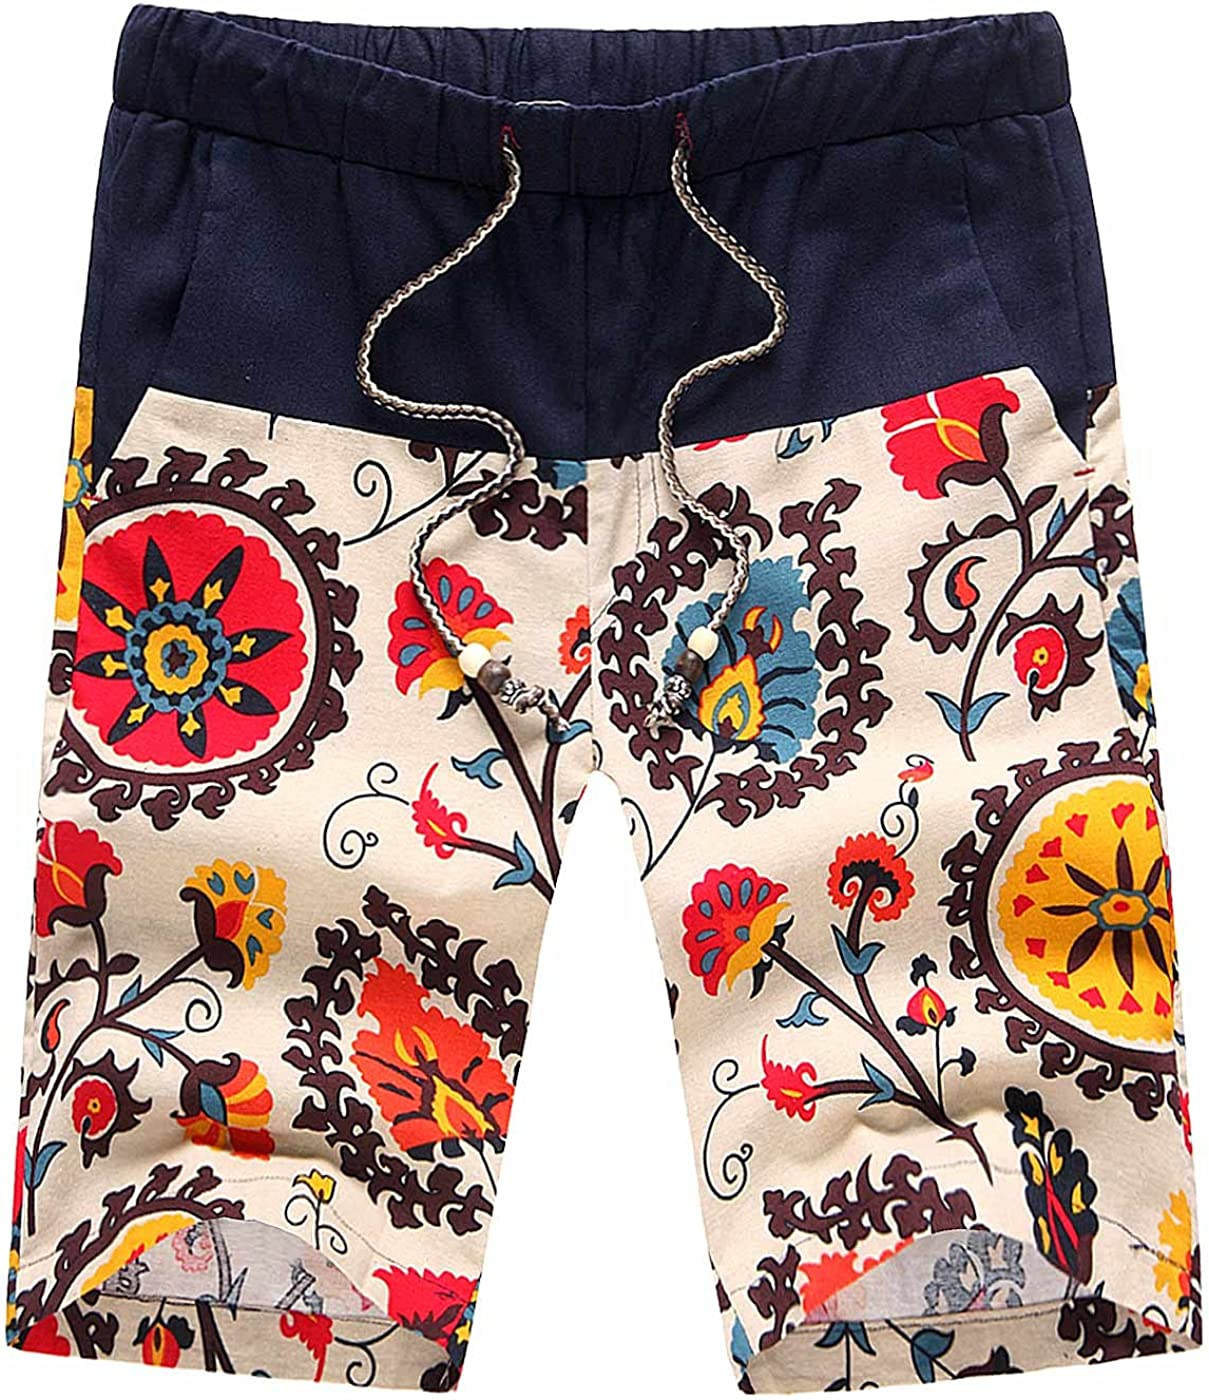 AIEOE Men Boardshorts Linen Floral Print Drawstring Quick Dry Hawaiian Shorts